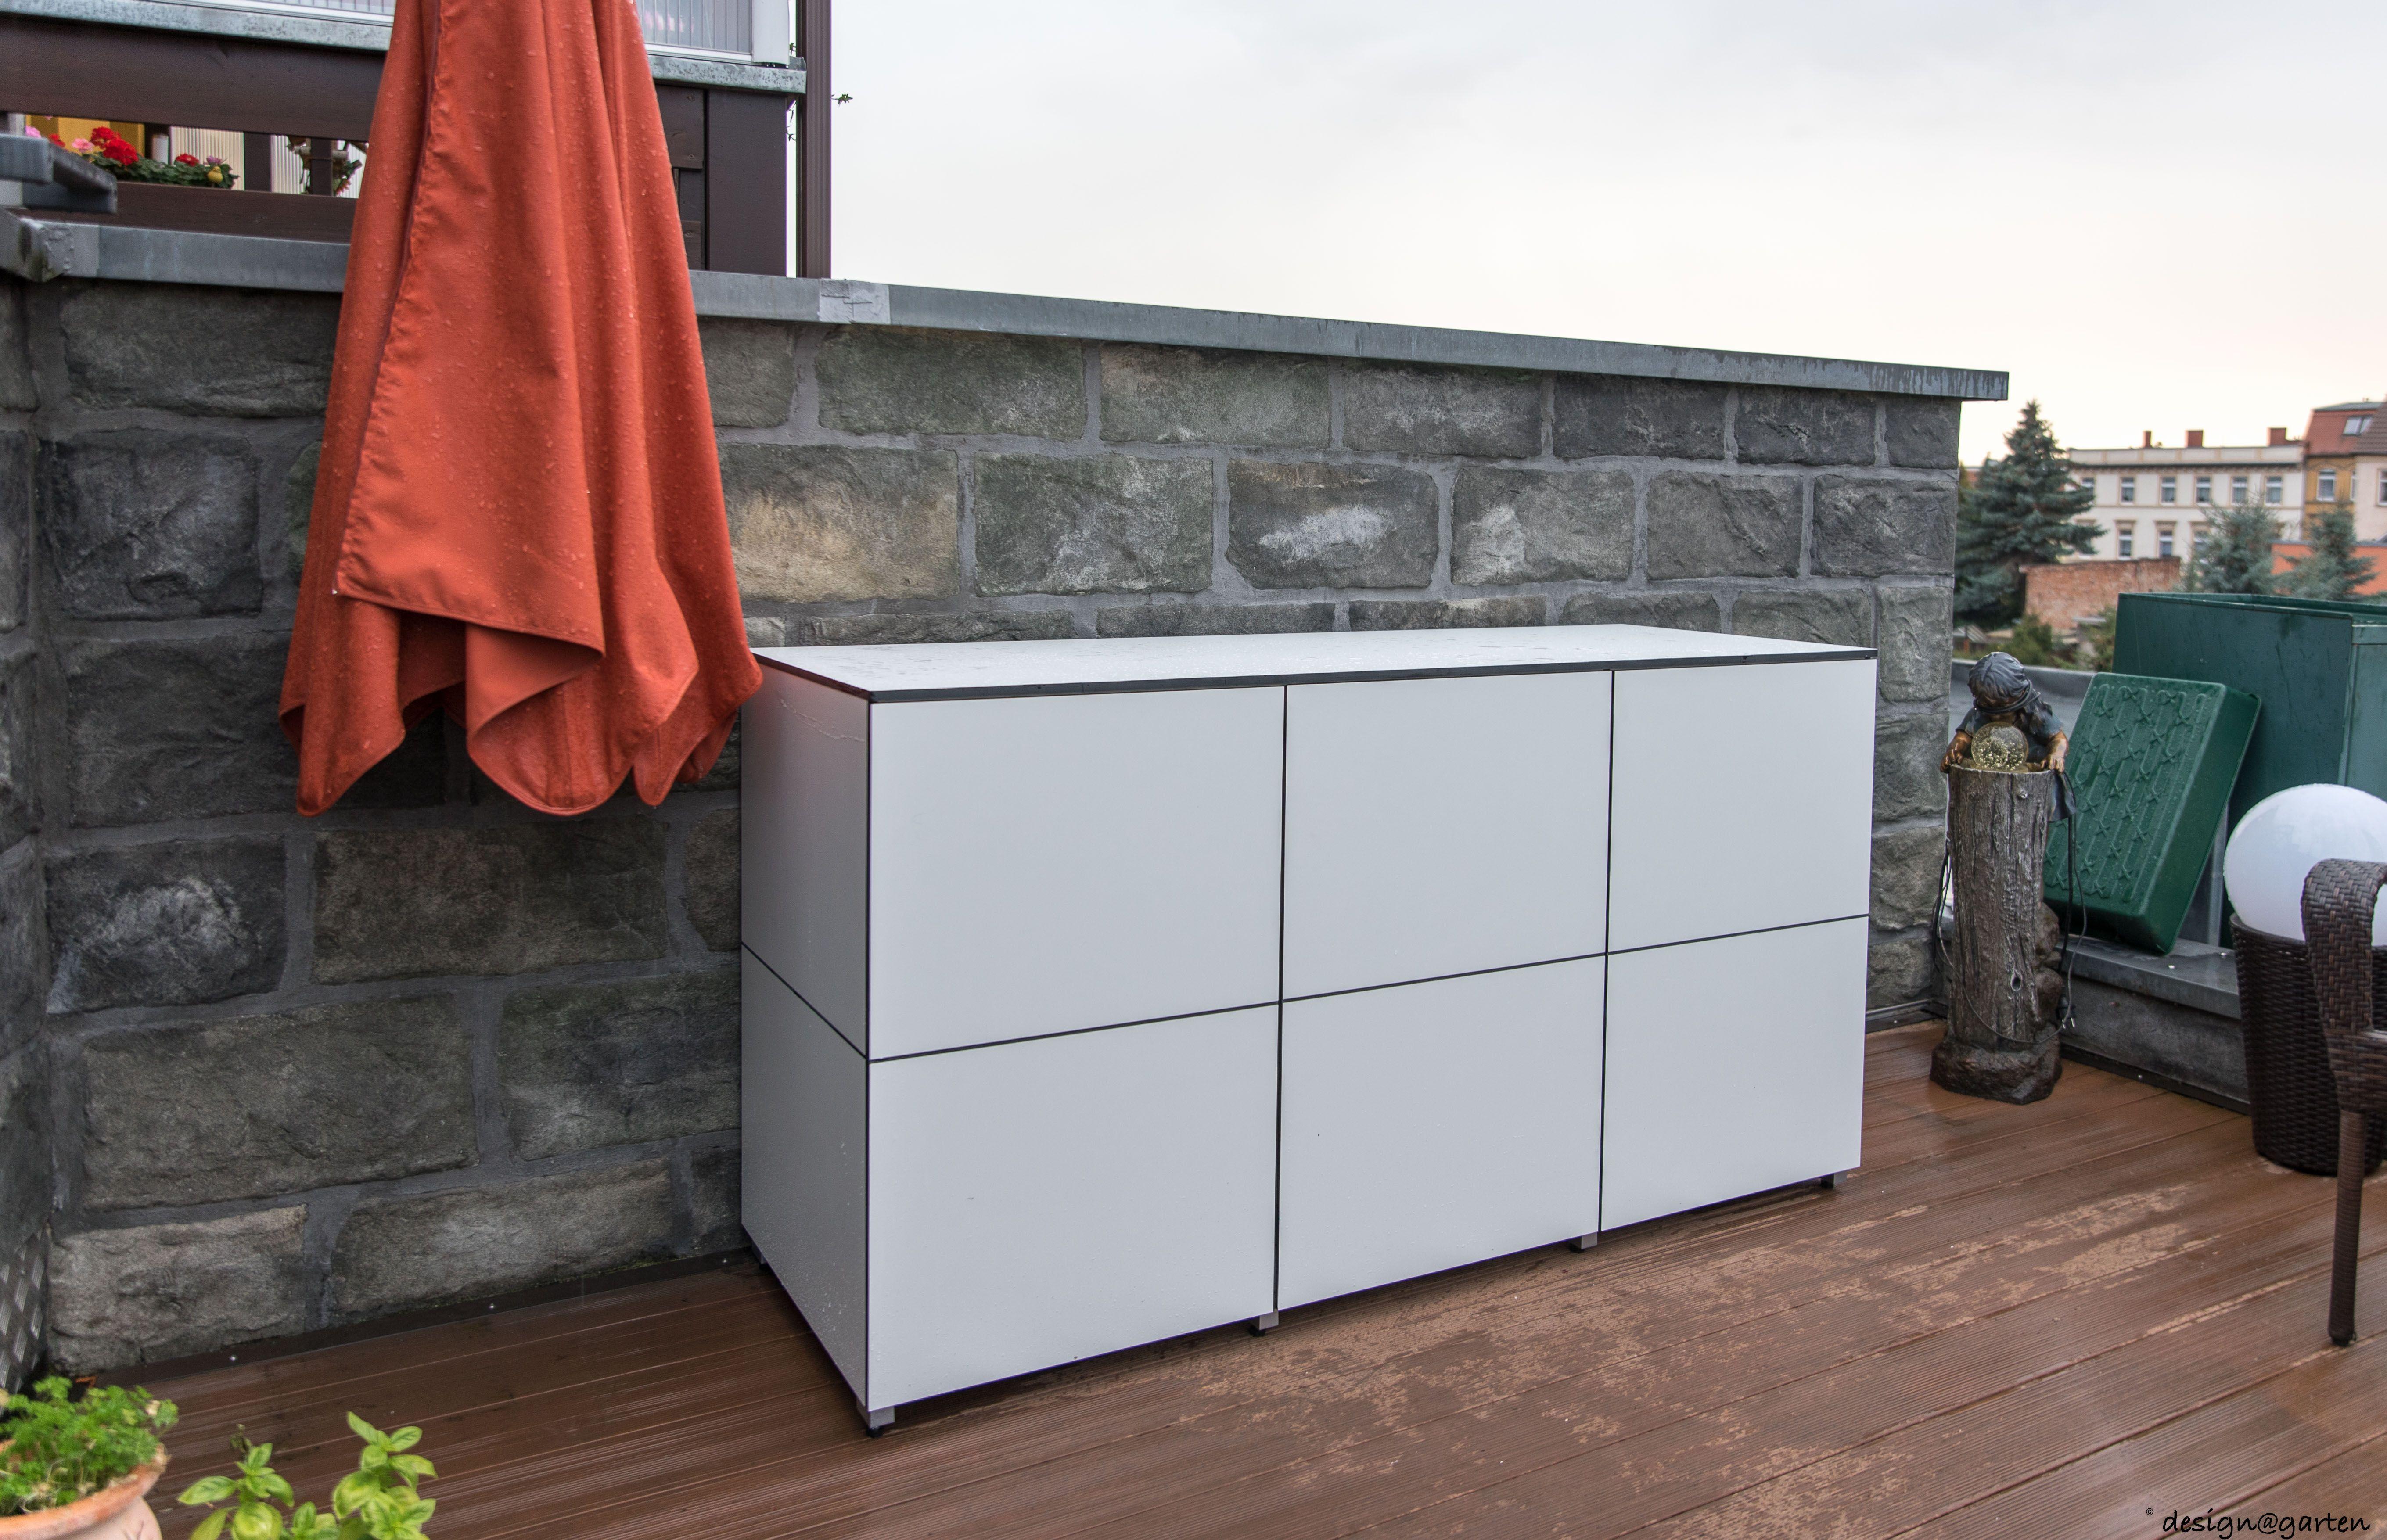 balkonschrank terrassenschrank sideboard win in k ln by design garten augsburg farbe. Black Bedroom Furniture Sets. Home Design Ideas